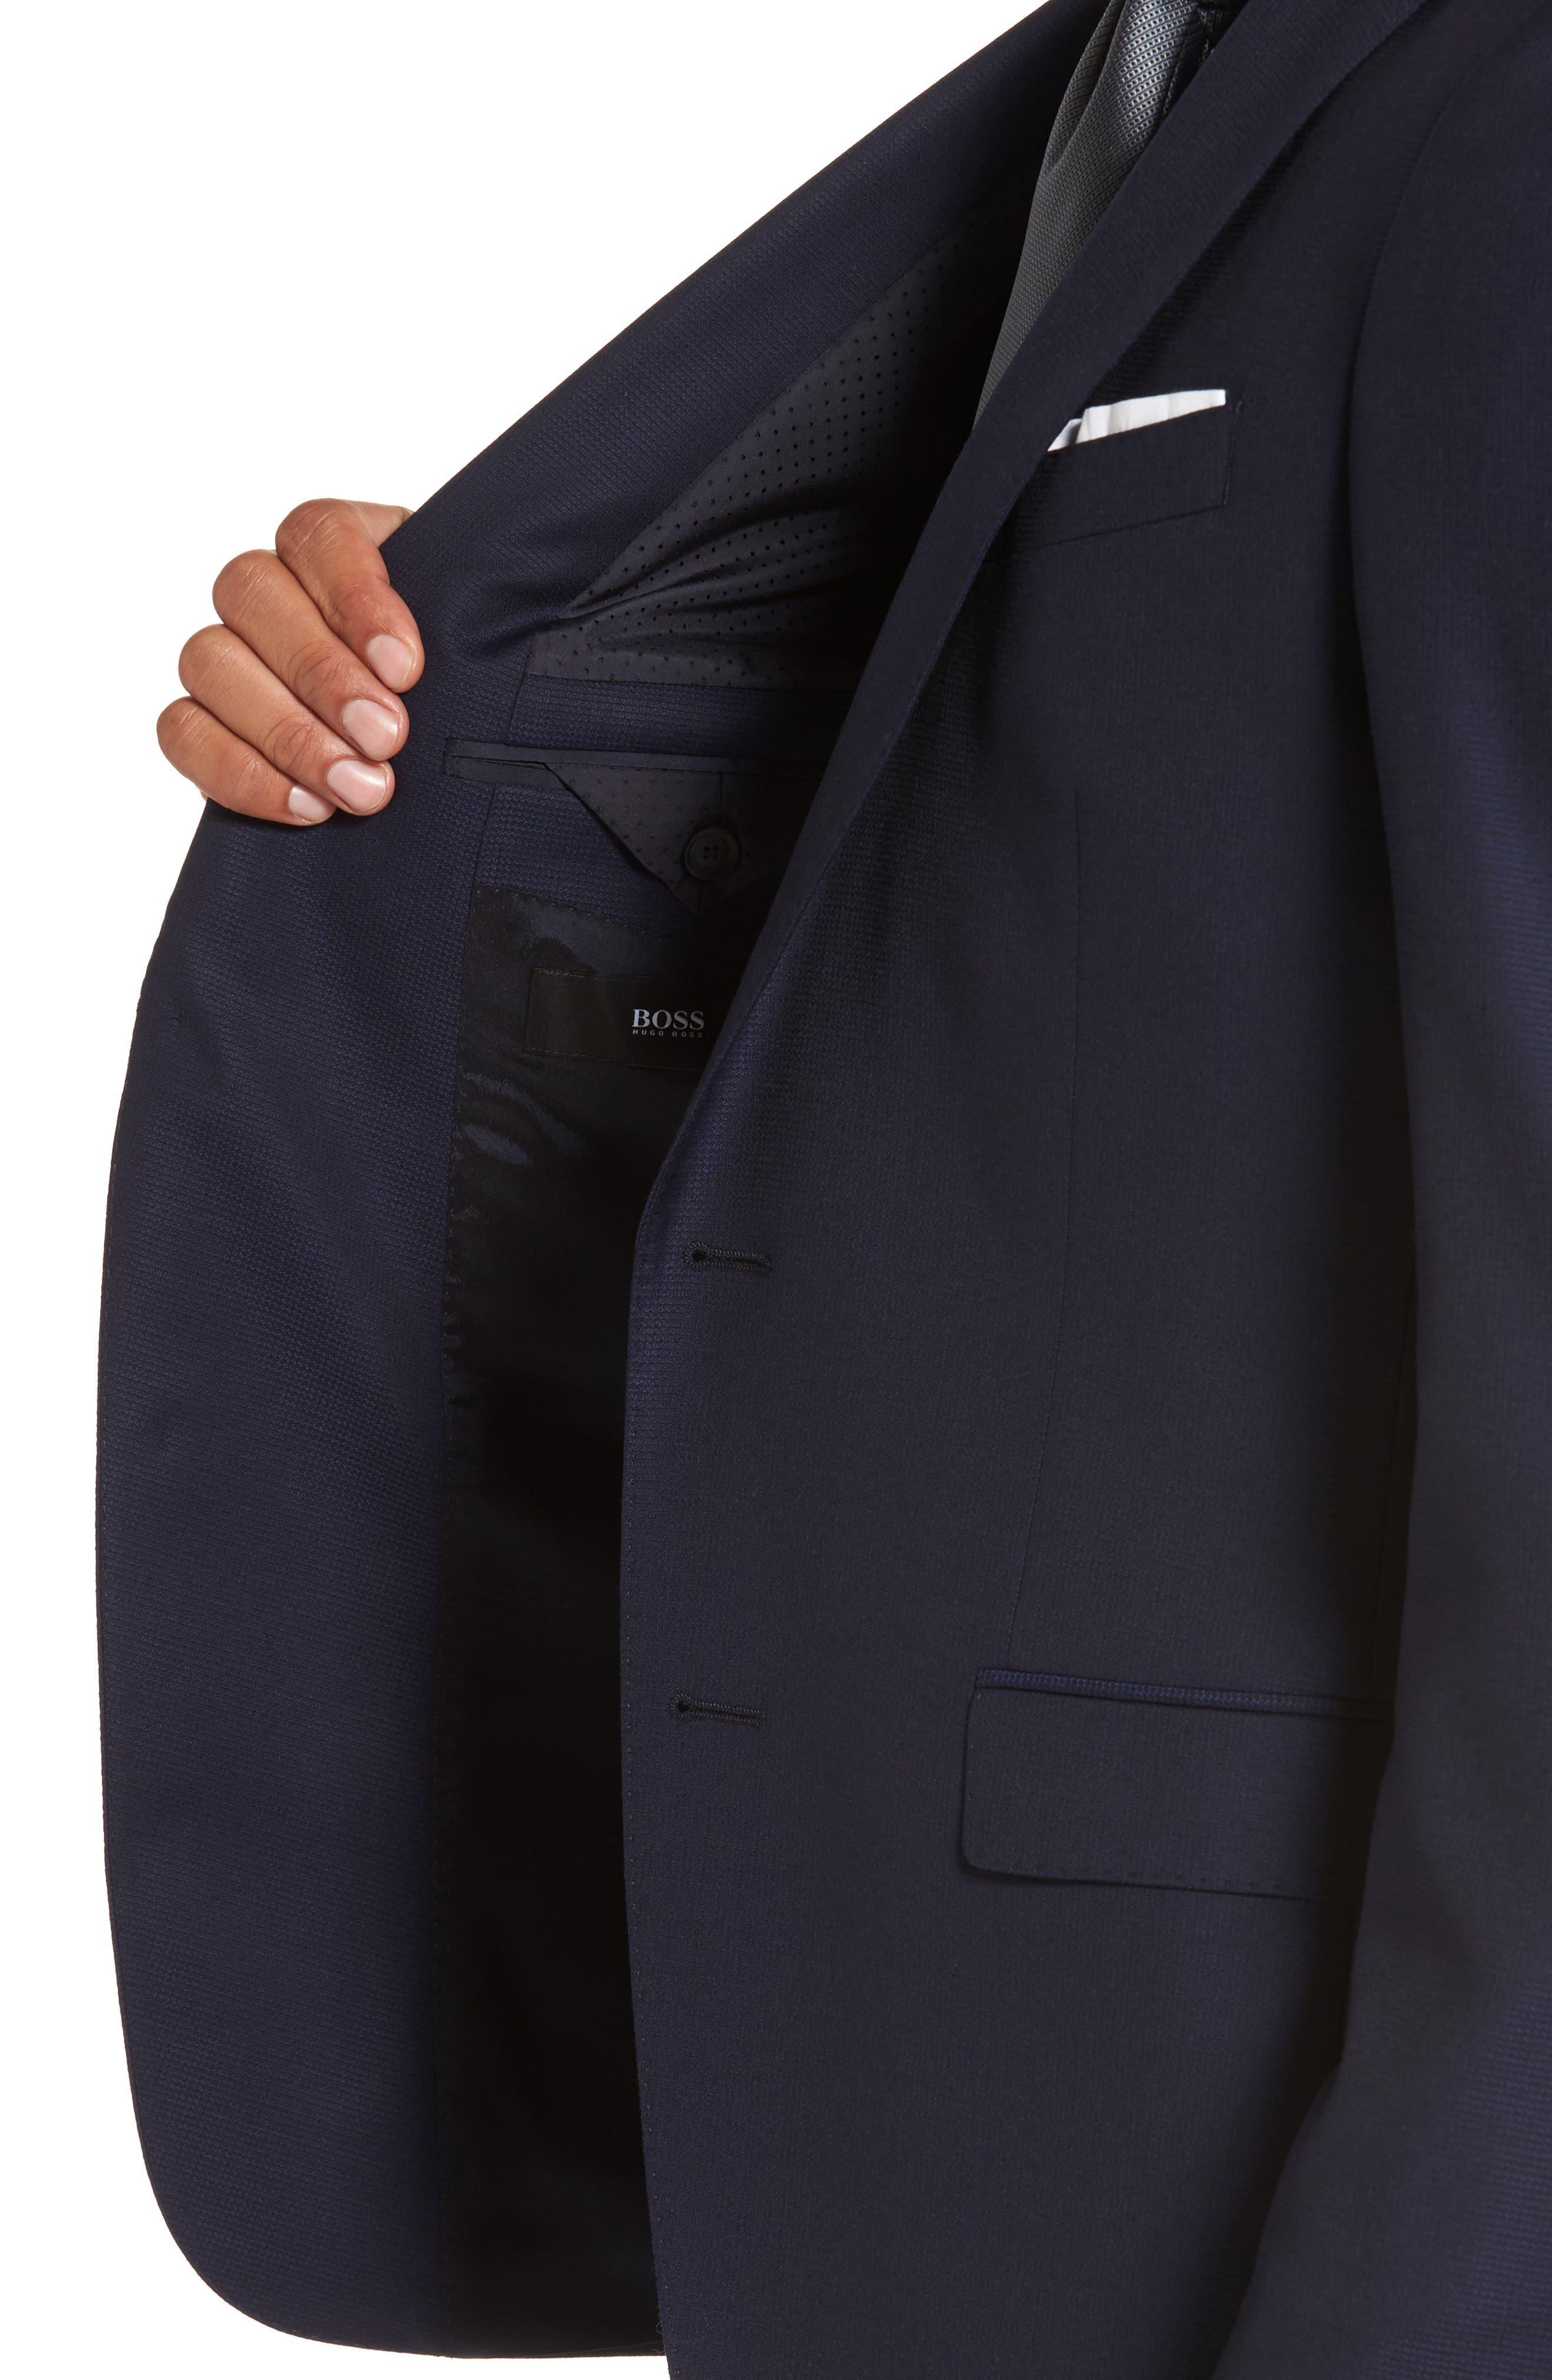 Nestro/Byte Trim Fit Solid Wool Suit,                             Alternate thumbnail 4, color,                             410